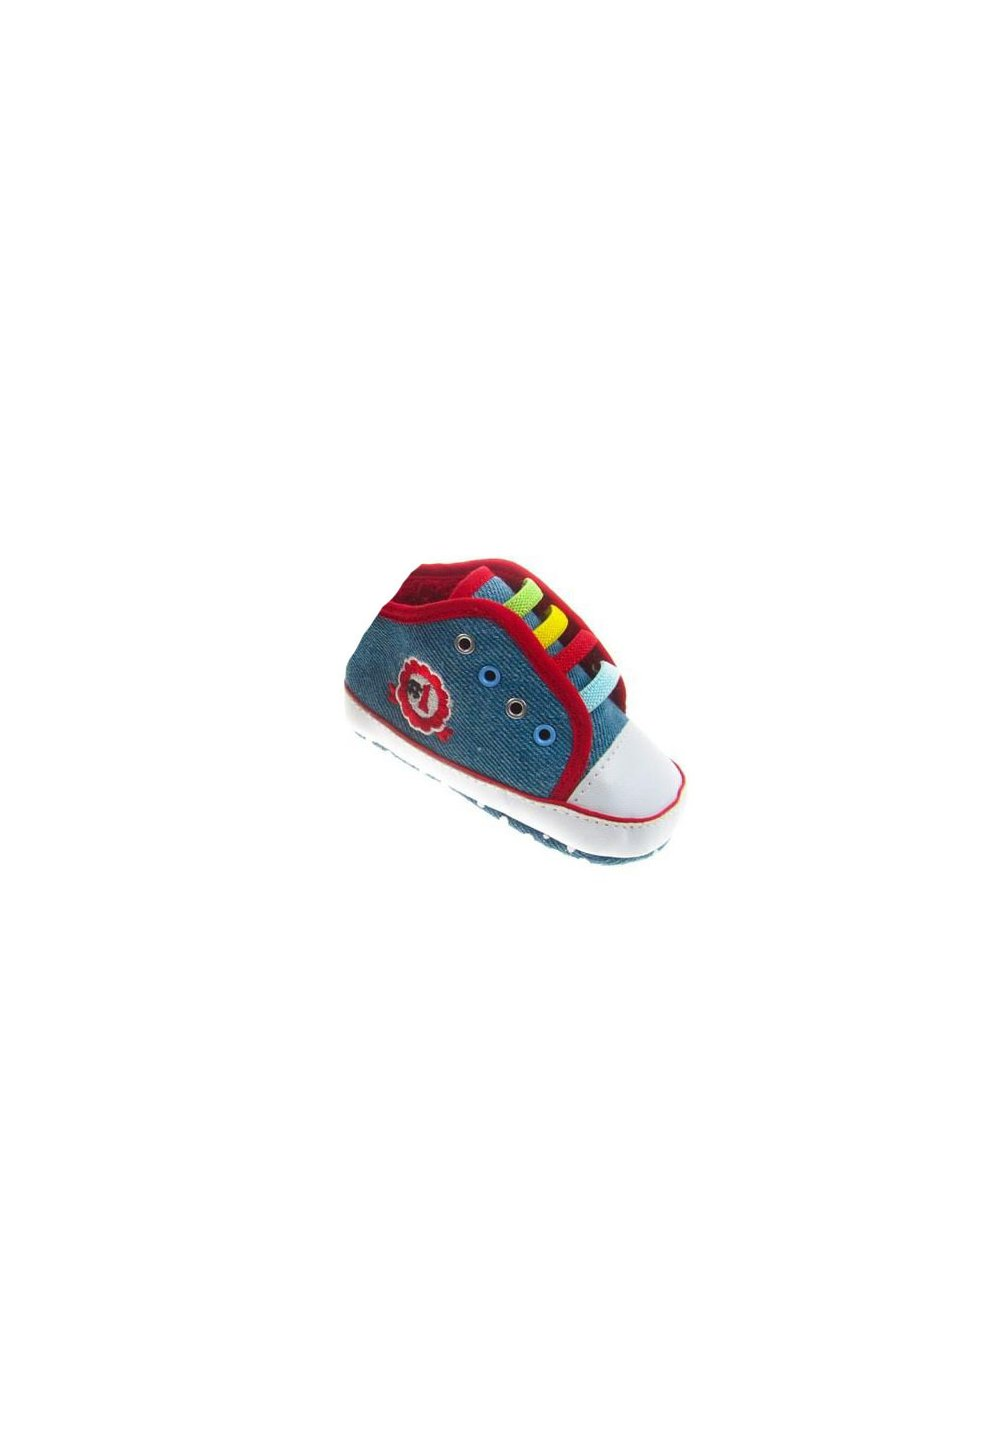 Papucei bebe din blug albastru deschis, model nr 1 imagine